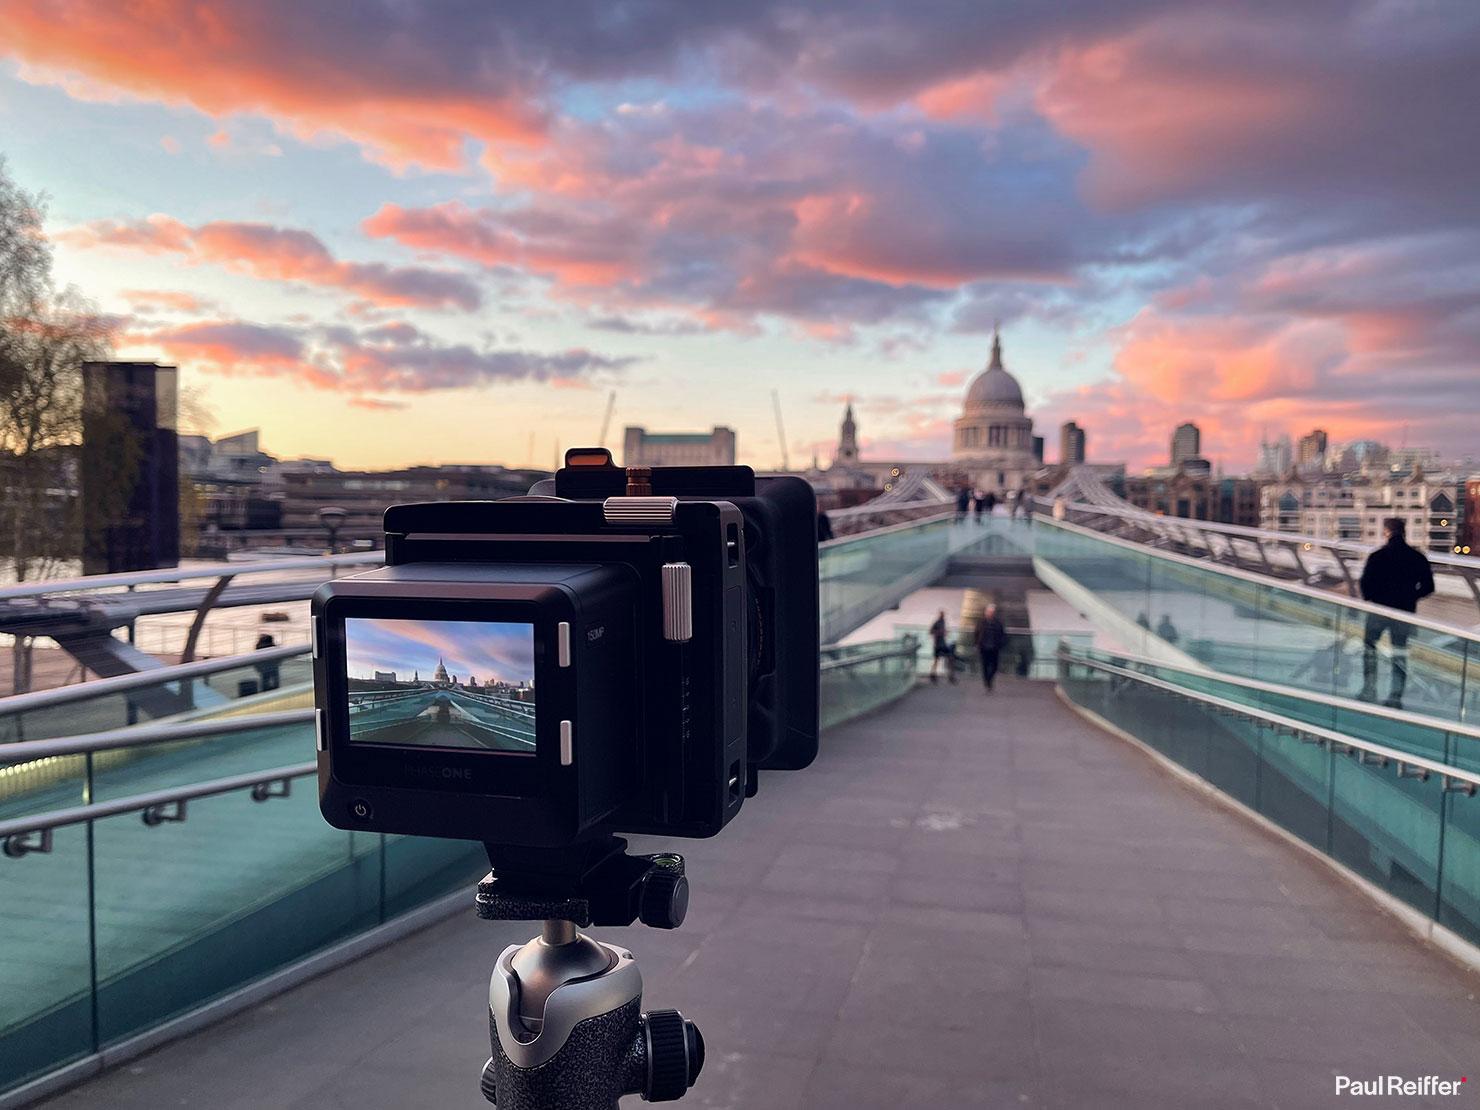 BTS New Beginnings St Pauls Millennium Bridge City Of London Sunset Frame Averaging Polar Pro Filters Long Exposure Phase One Sky Paul Reiffer Landscape Photographer